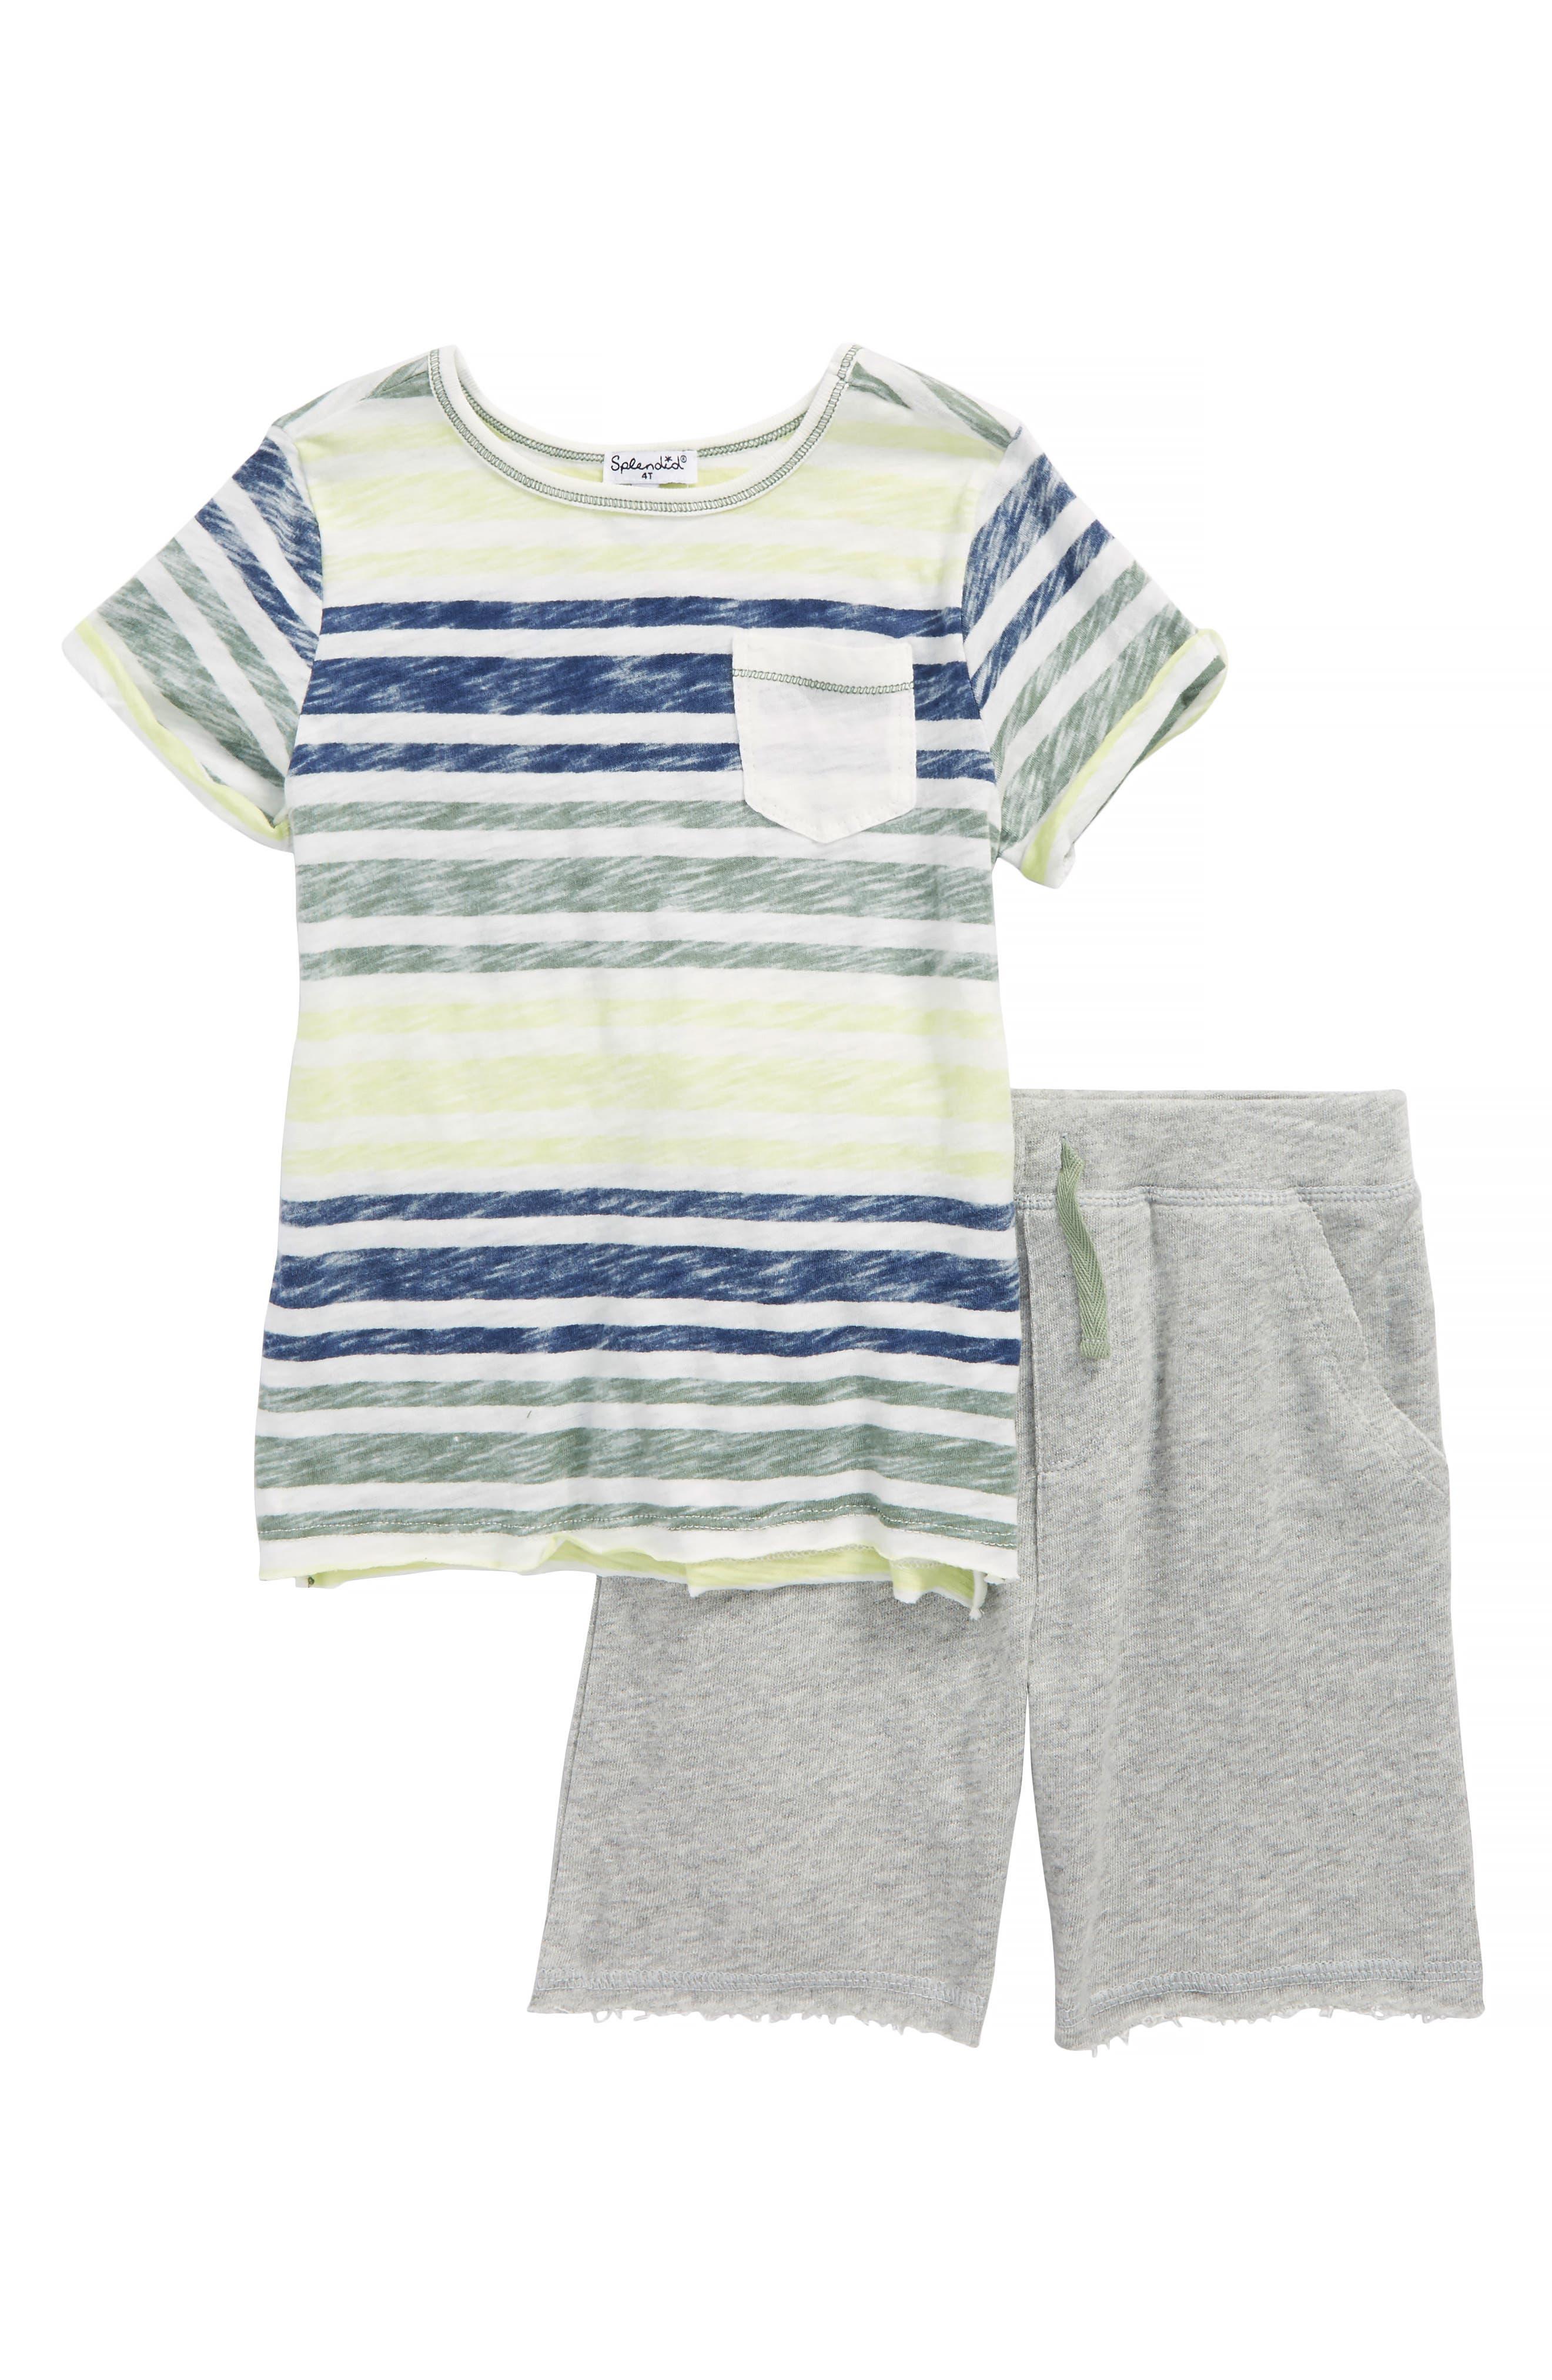 Main Image - Splendid Reverse Stripe Shirt & Knit Shorts Set (Toddler Boys & Little Boys)